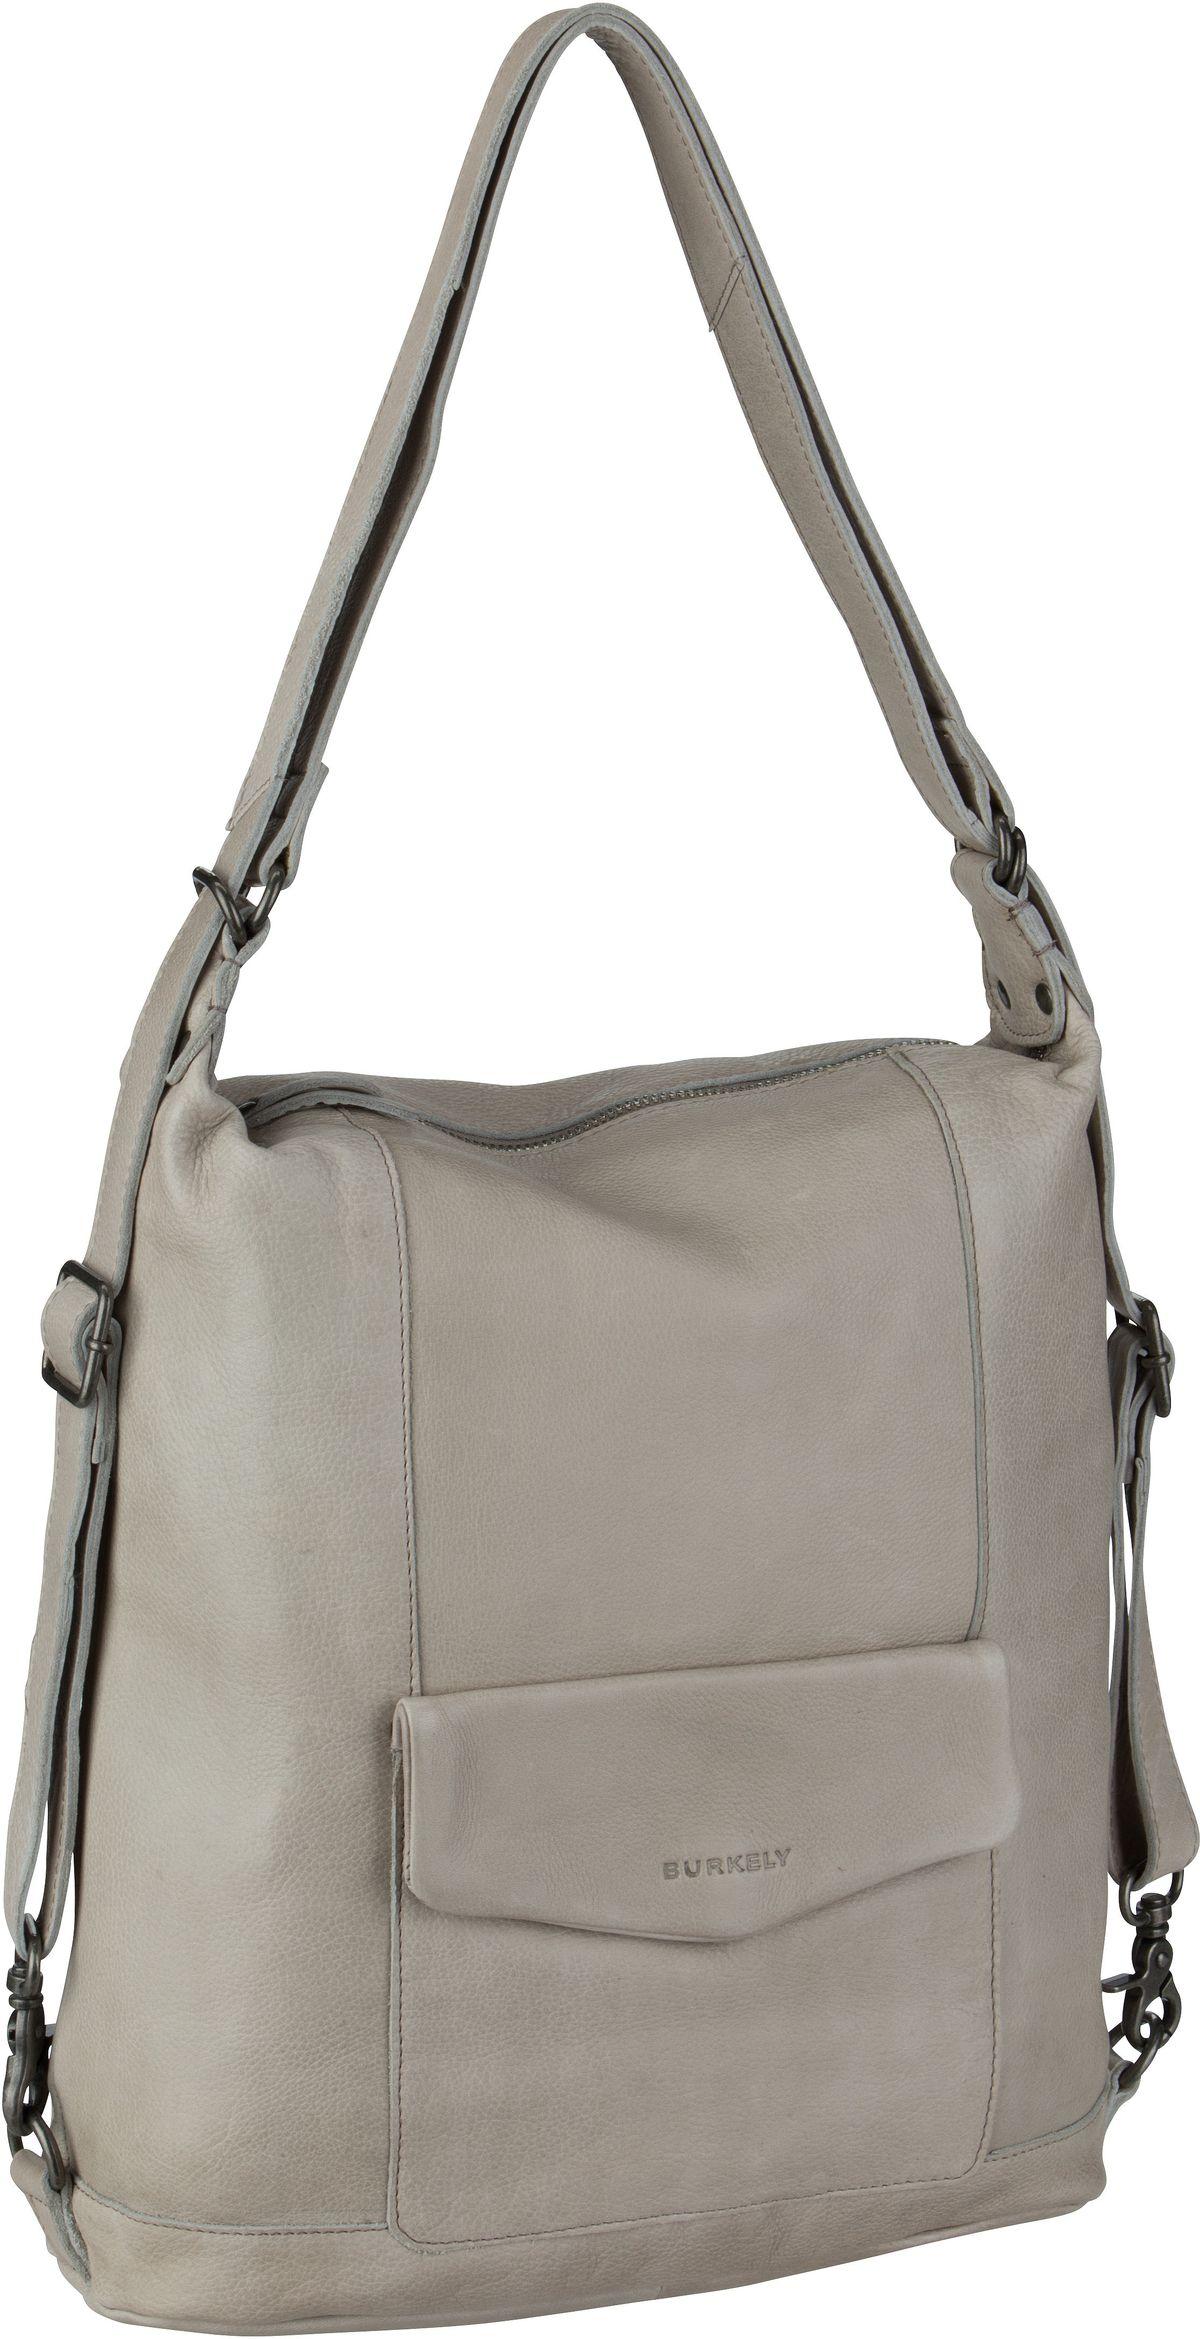 Burkely Handtasche Just Jackie Backpack 2584 Light Grey